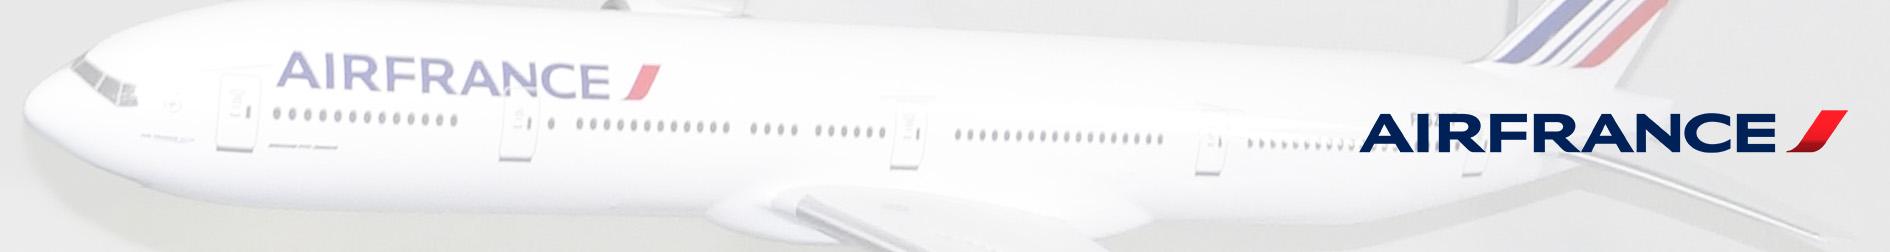 airfrance-.jpg